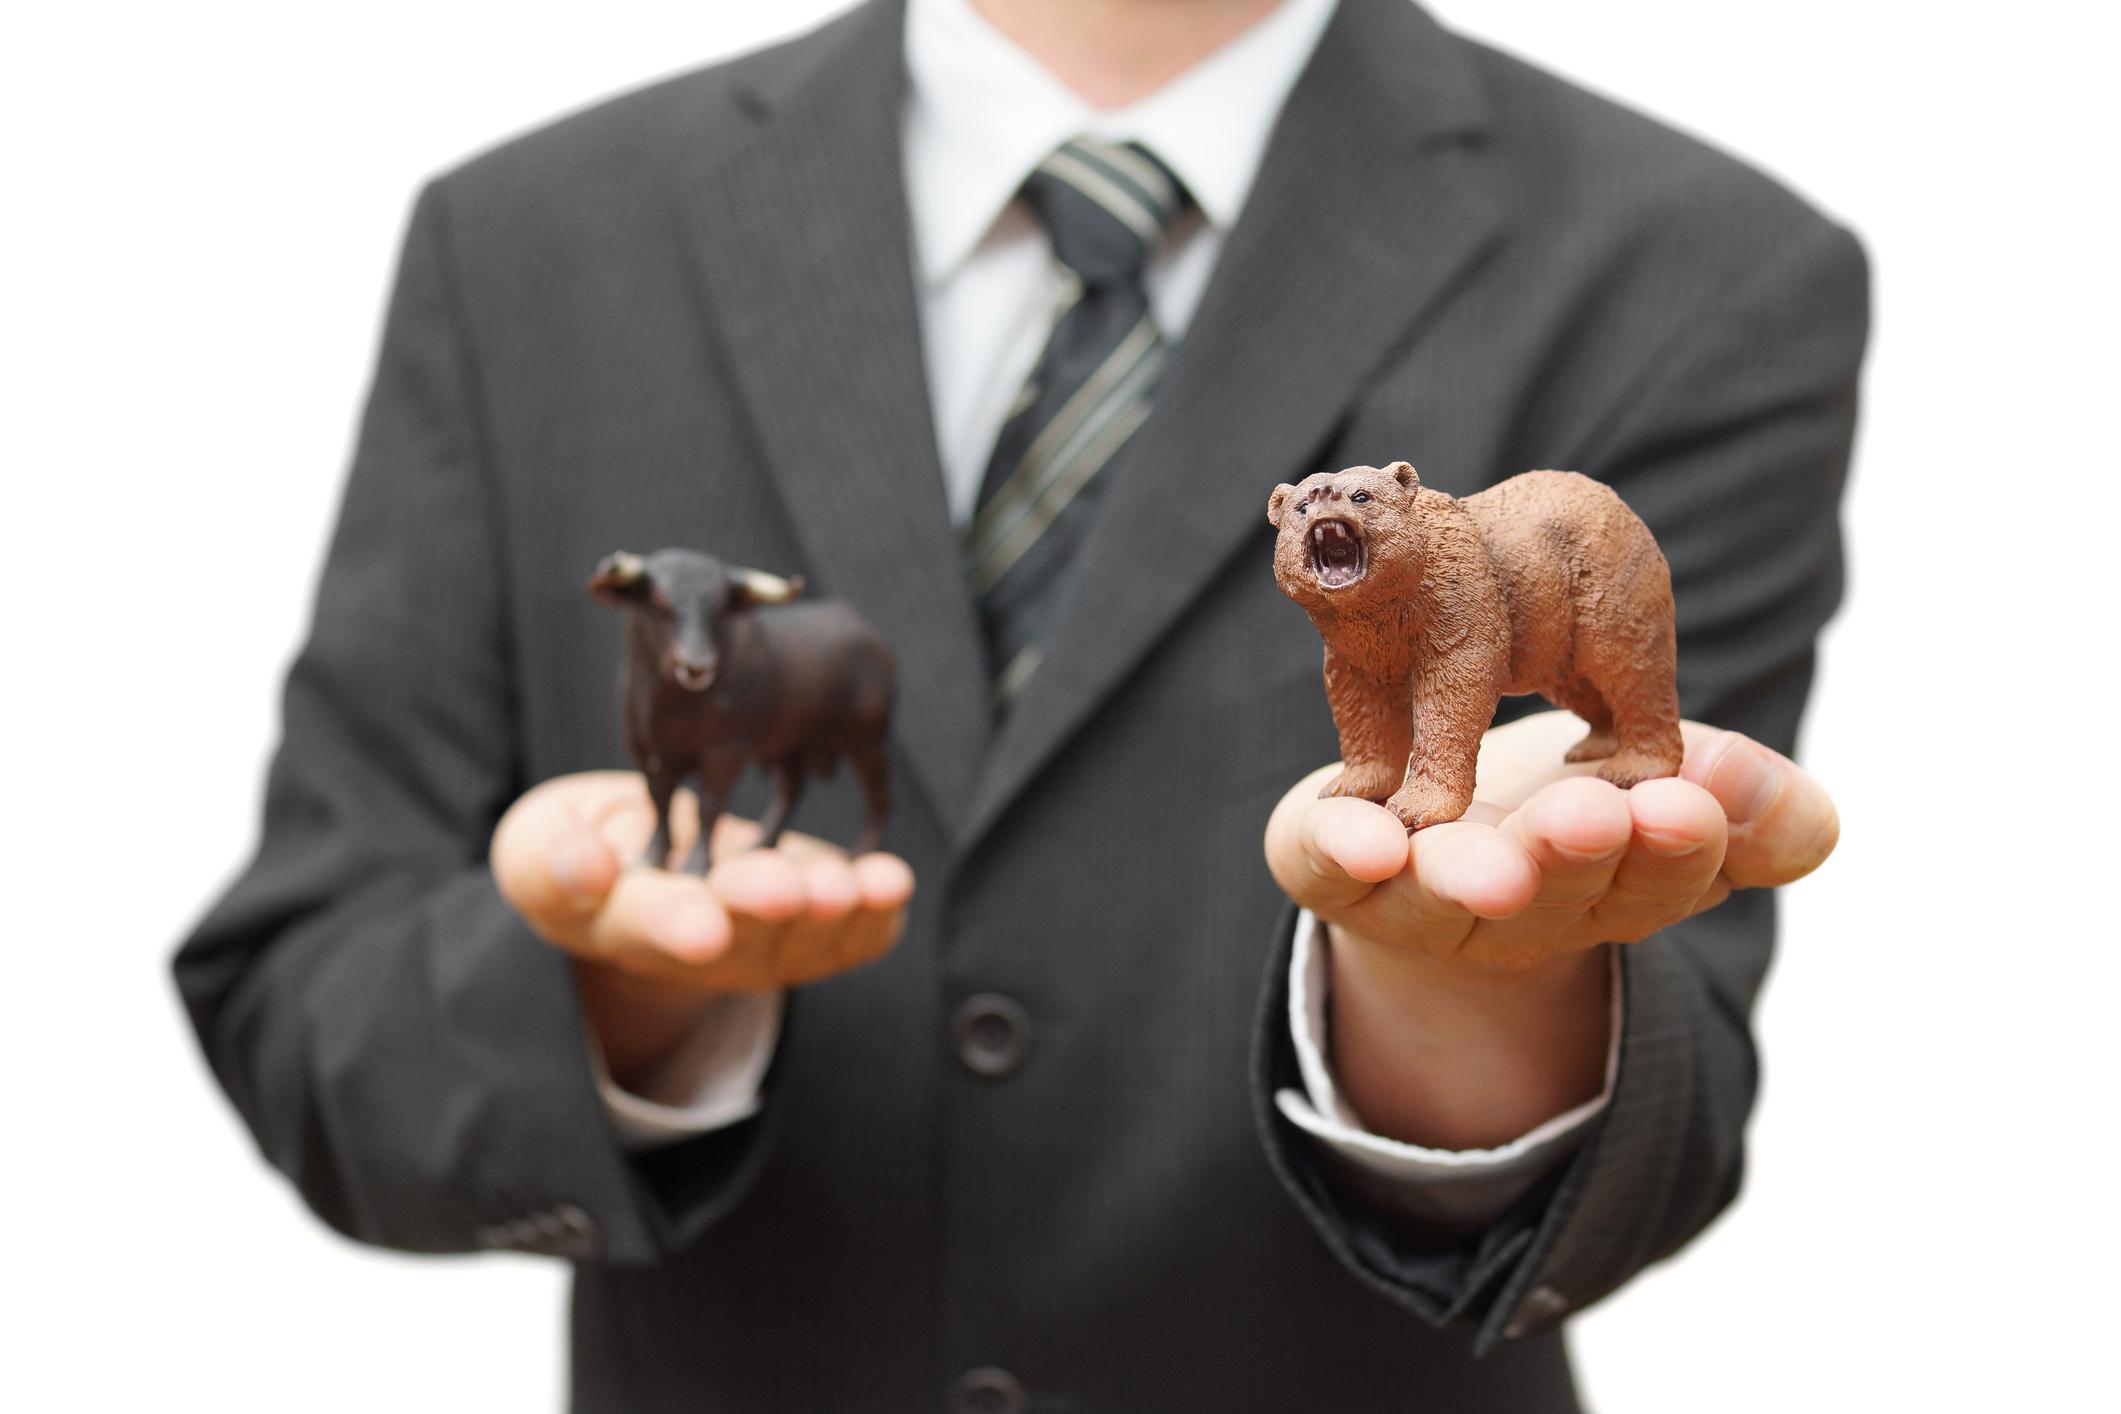 Is GlaxoSmithKline plc Stock a Buy? | The Motley Fool